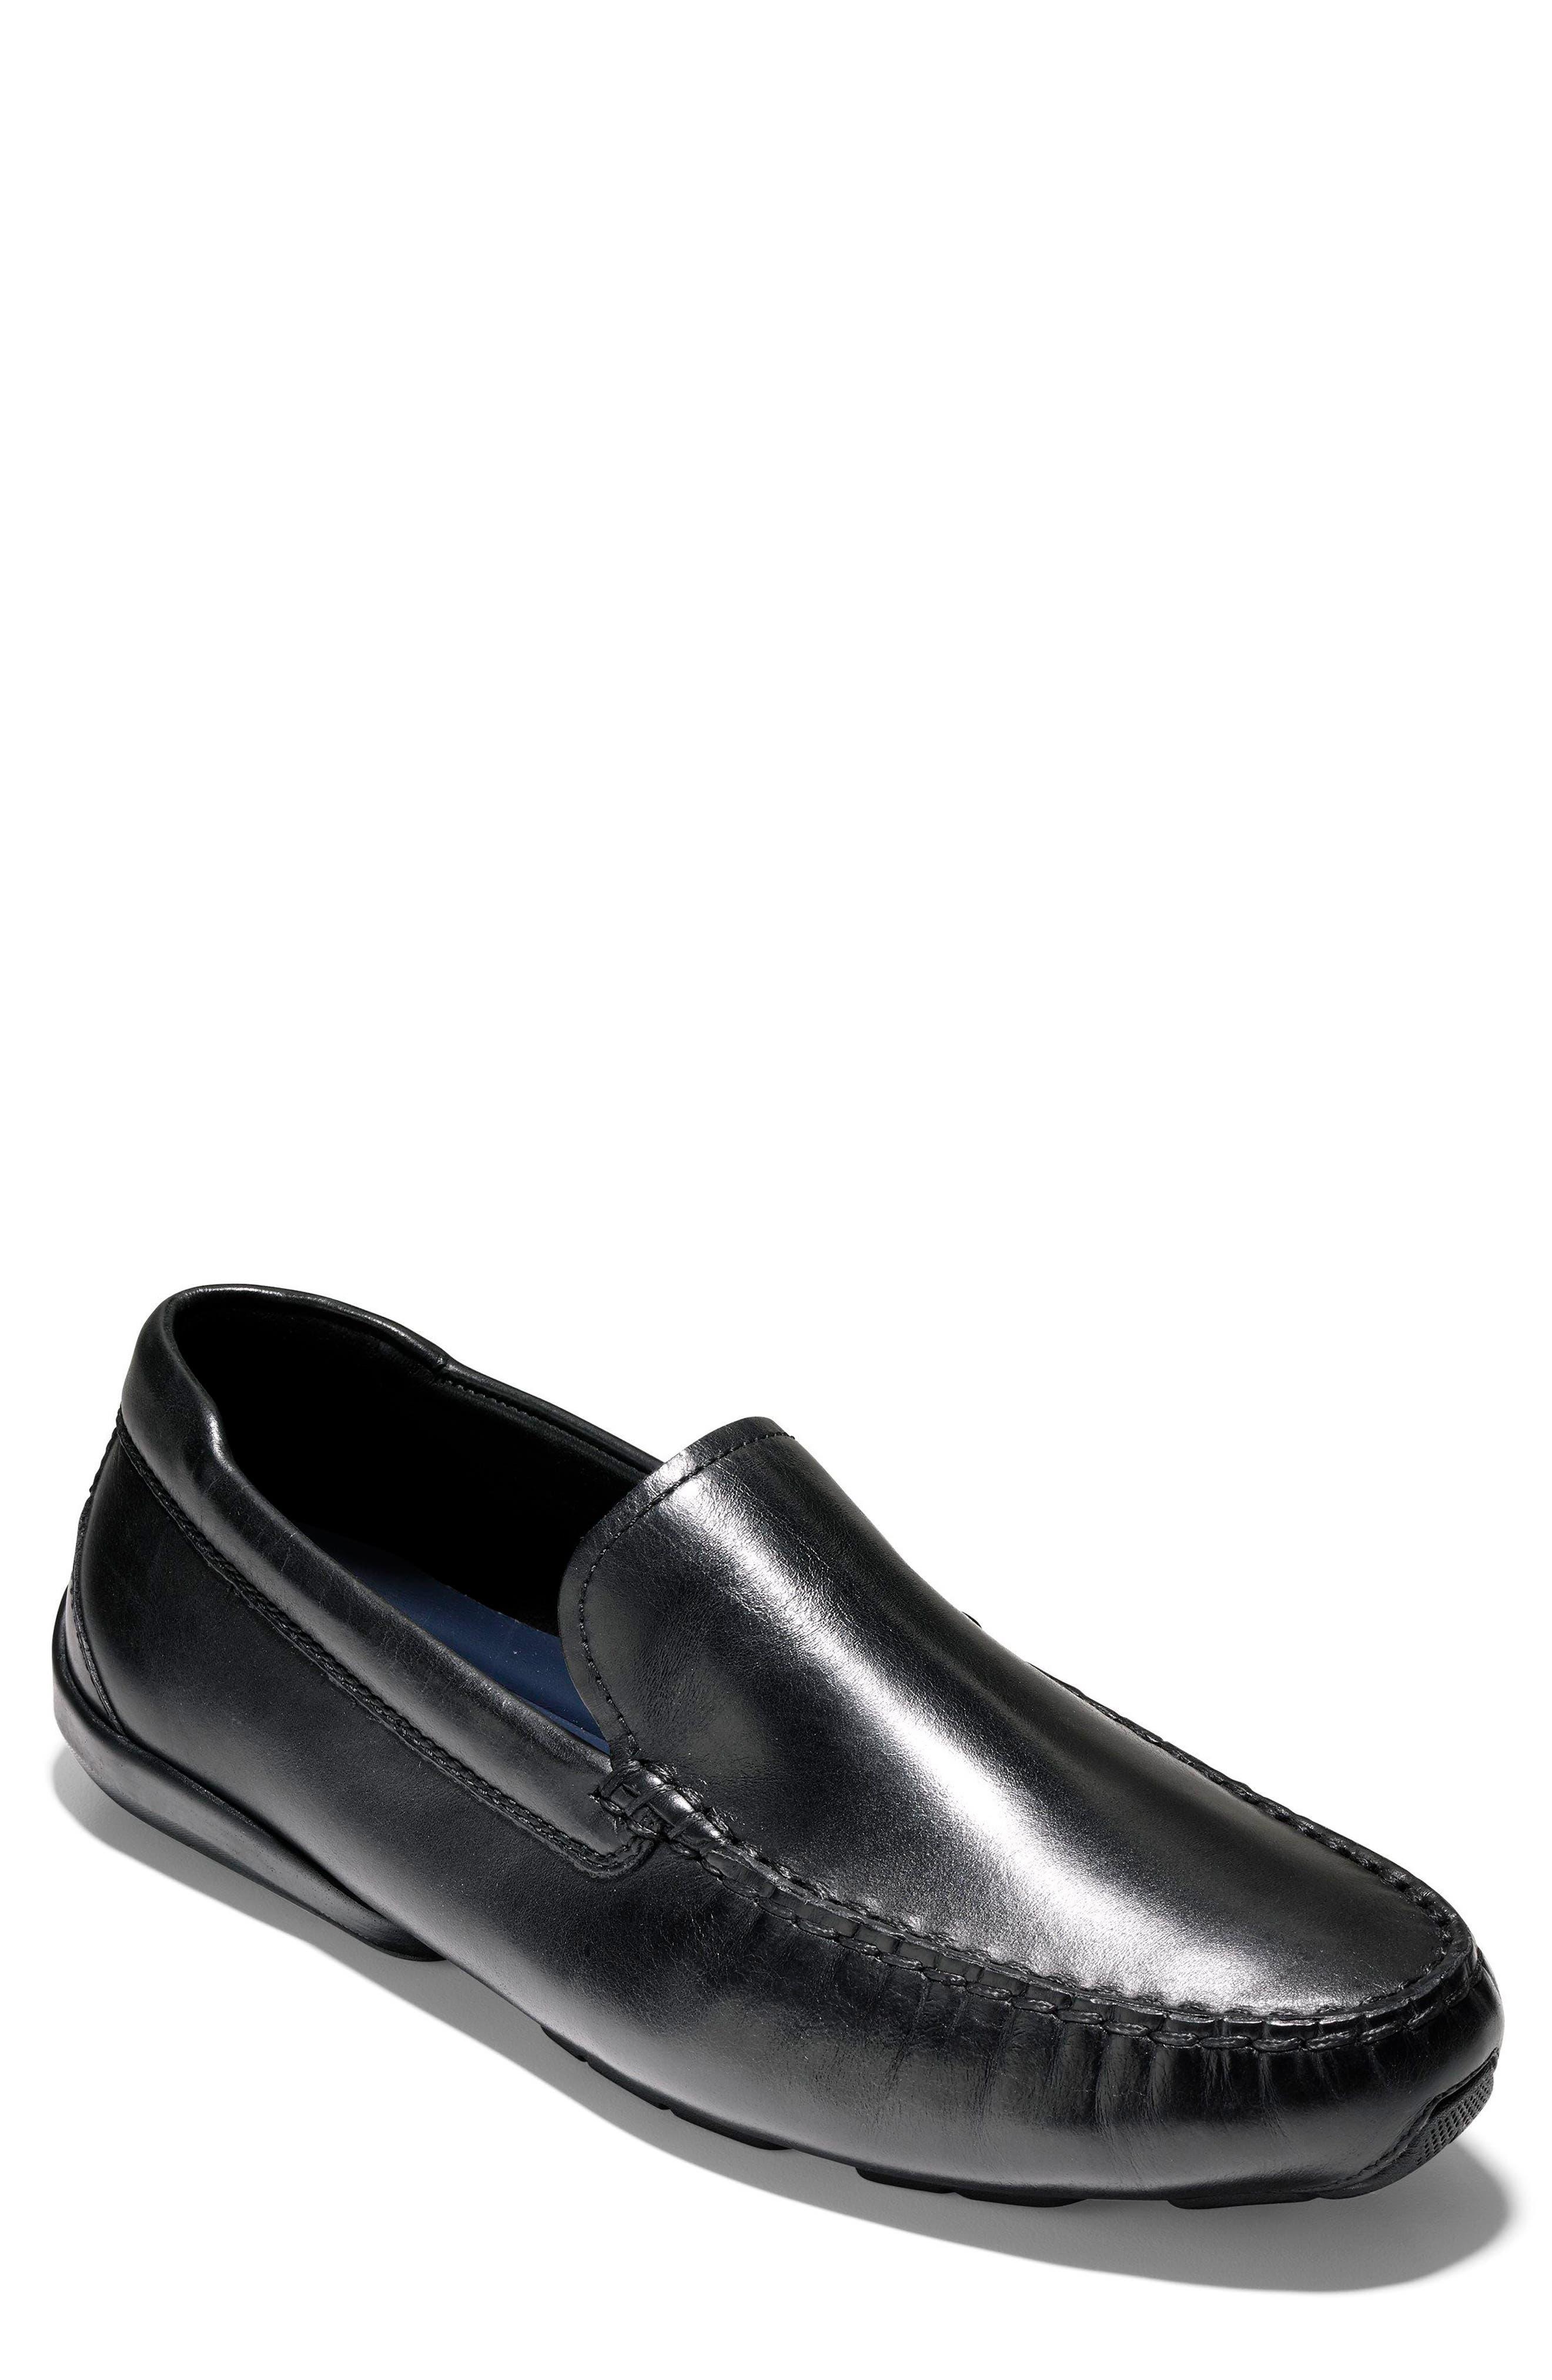 Branson Driving Shoe,                             Main thumbnail 1, color,                             Black Leather